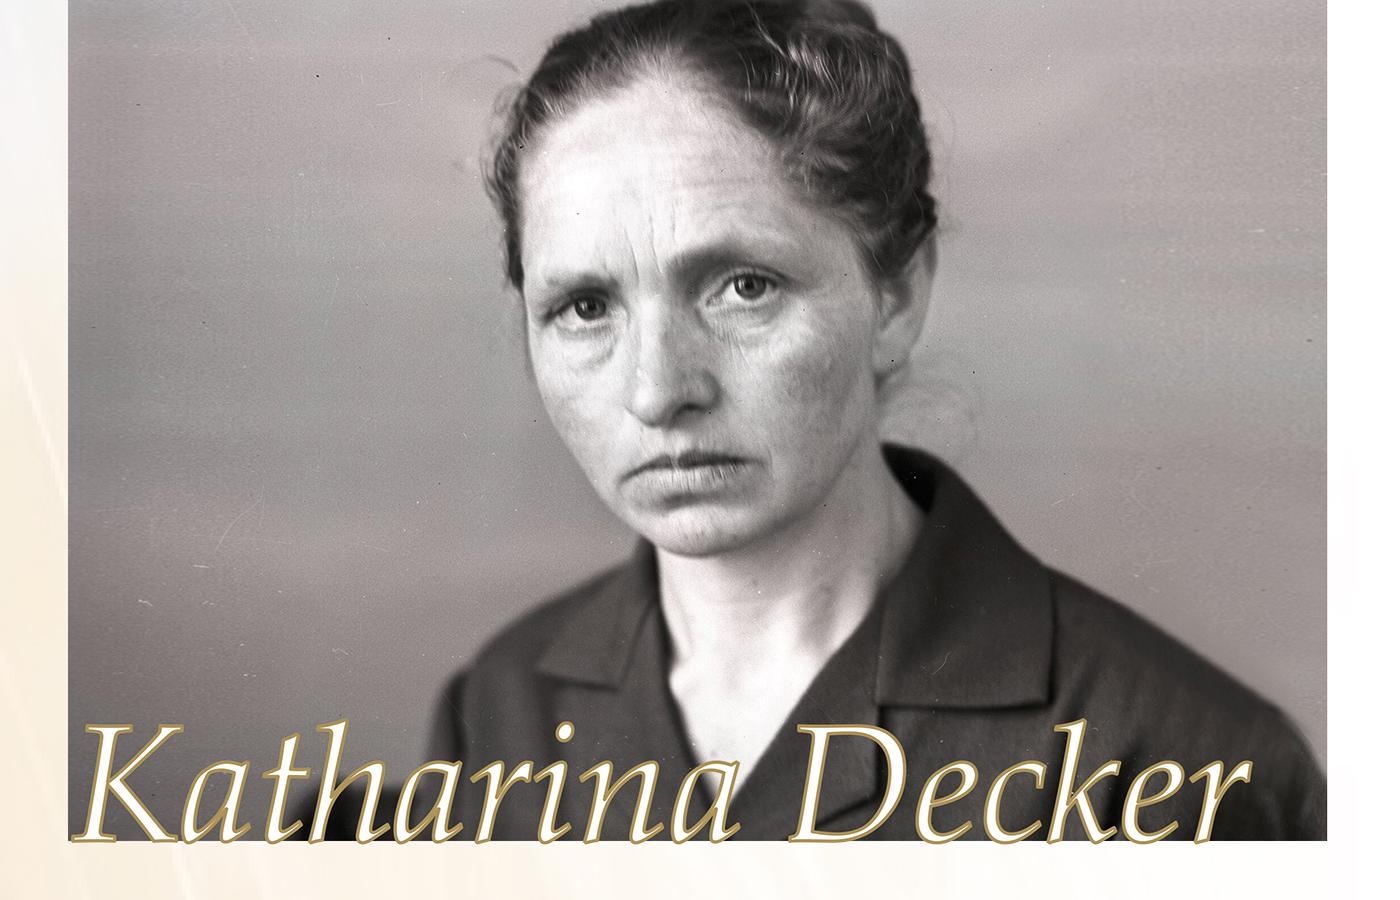 Katharina Decker